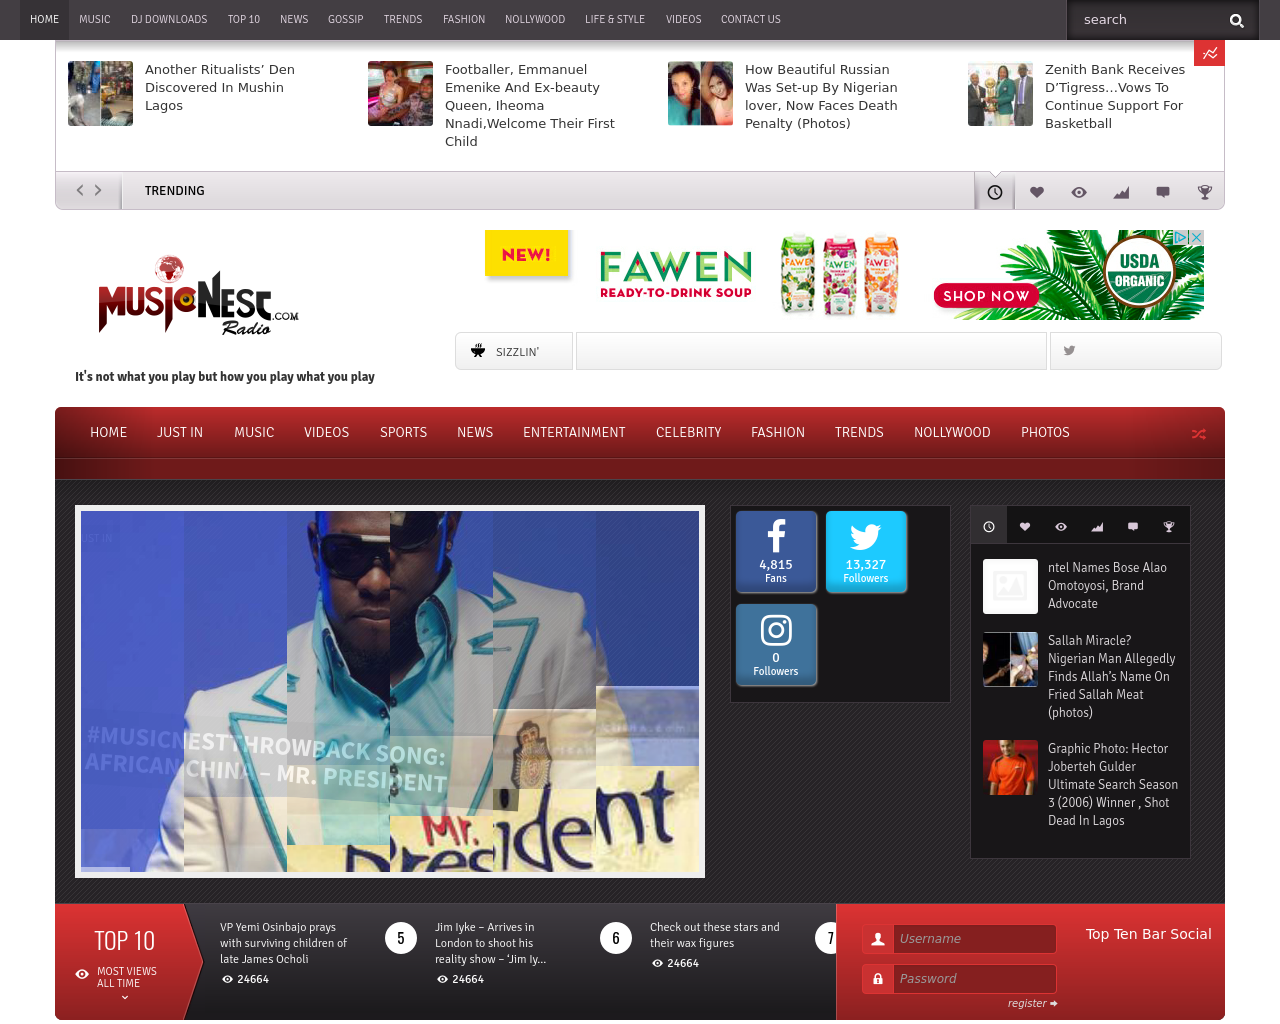 Music-Nest-Radio-Advertising-Reviews-Pricing